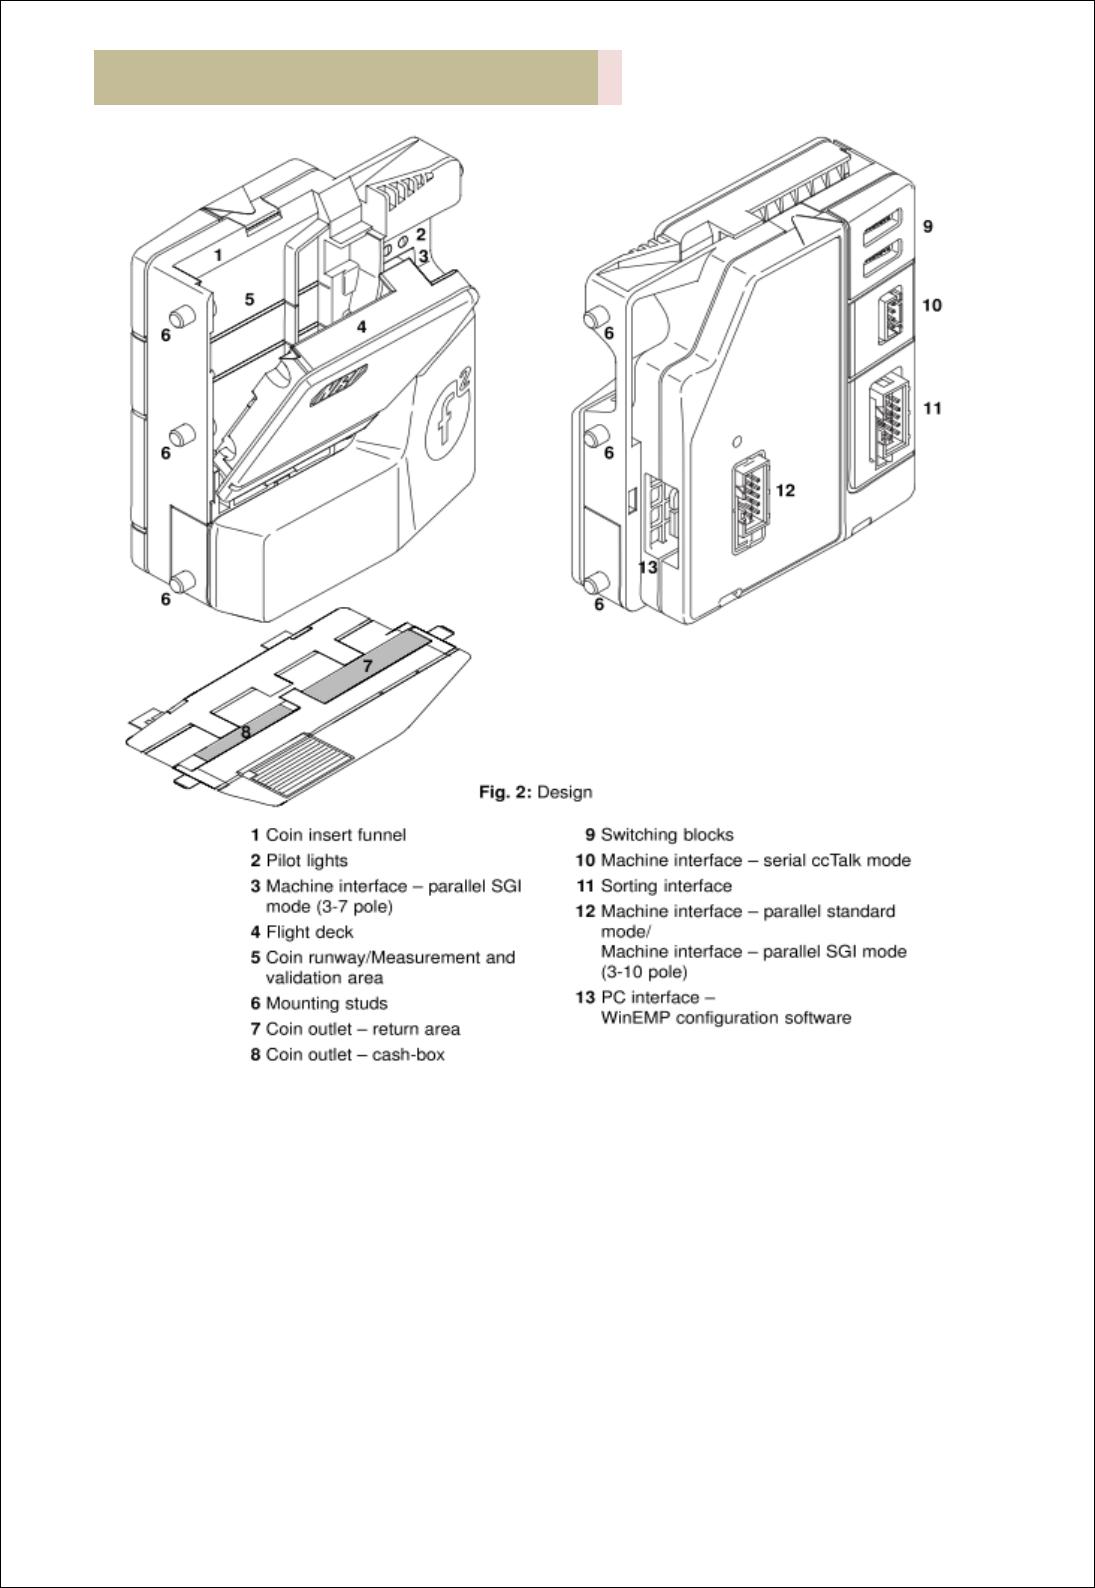 LG CNS KSCCB400C BUS TICKETING SYSTEM(RFID) User Manual